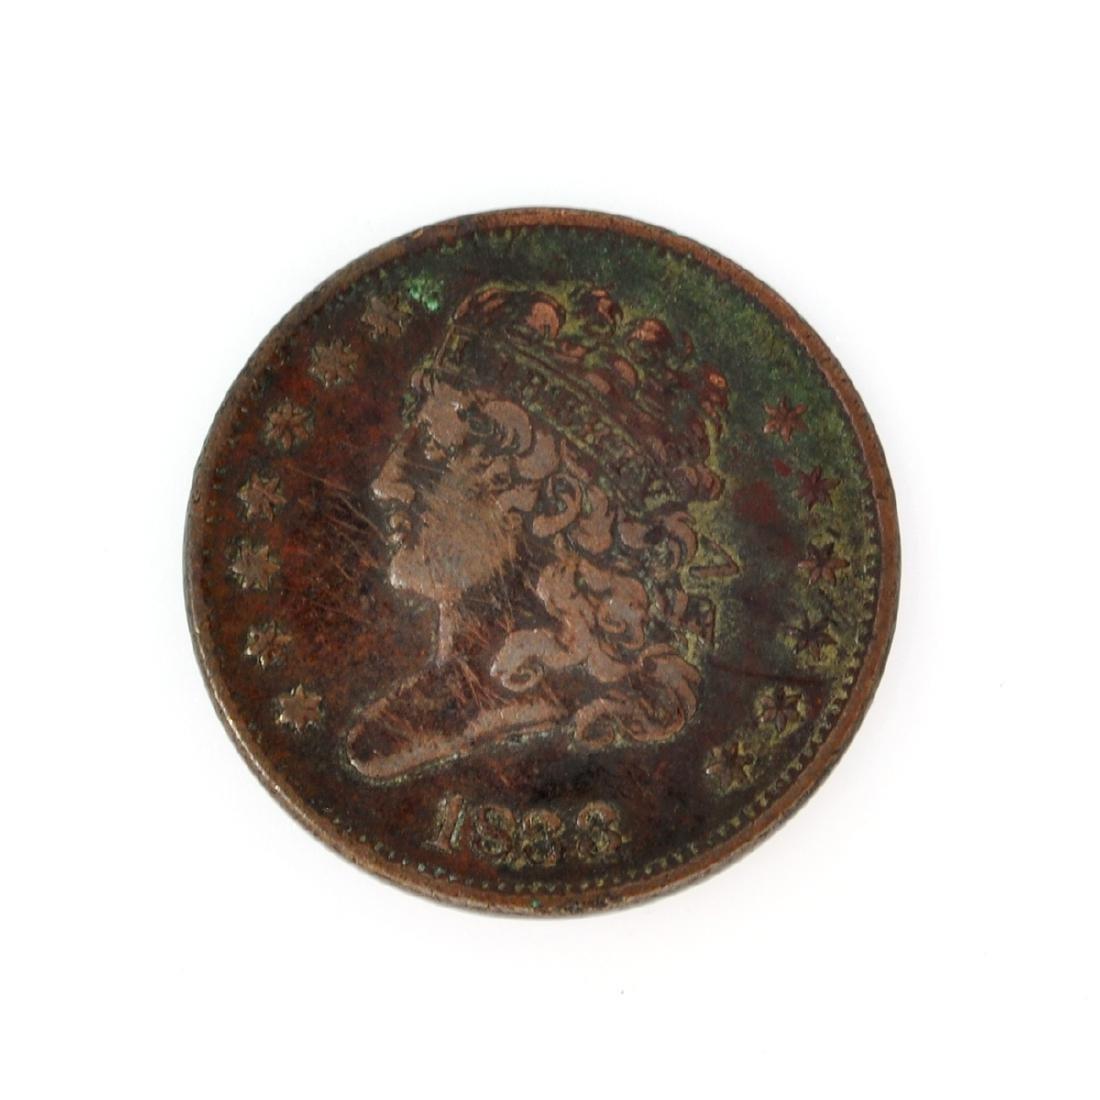 1833 Classic Head Half Cent Coin